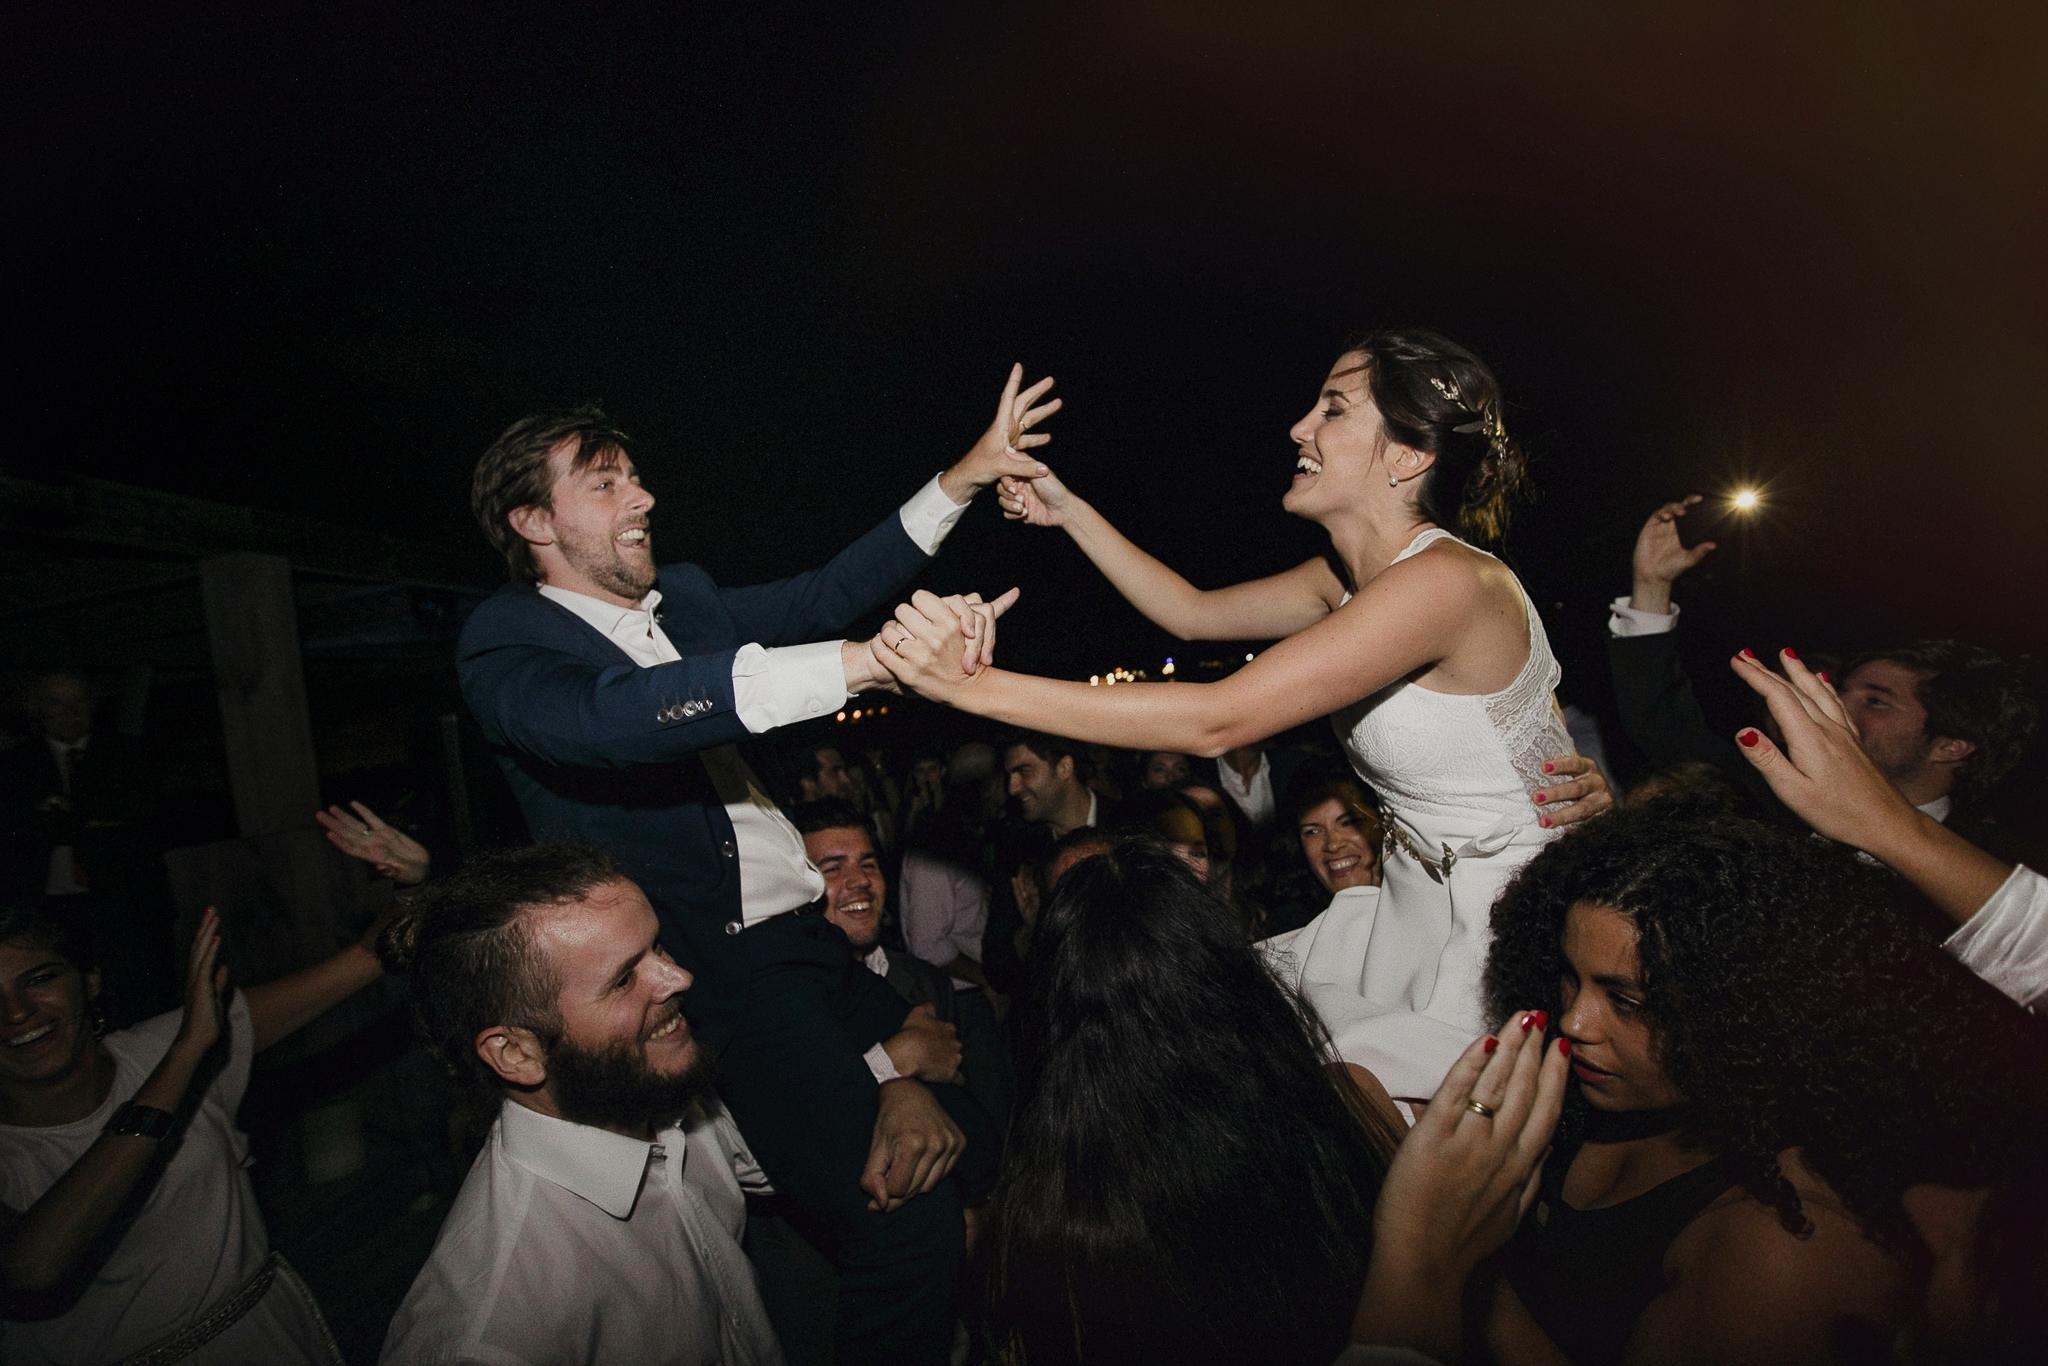 fotografia diferente - fotografo de casamientos uruguay